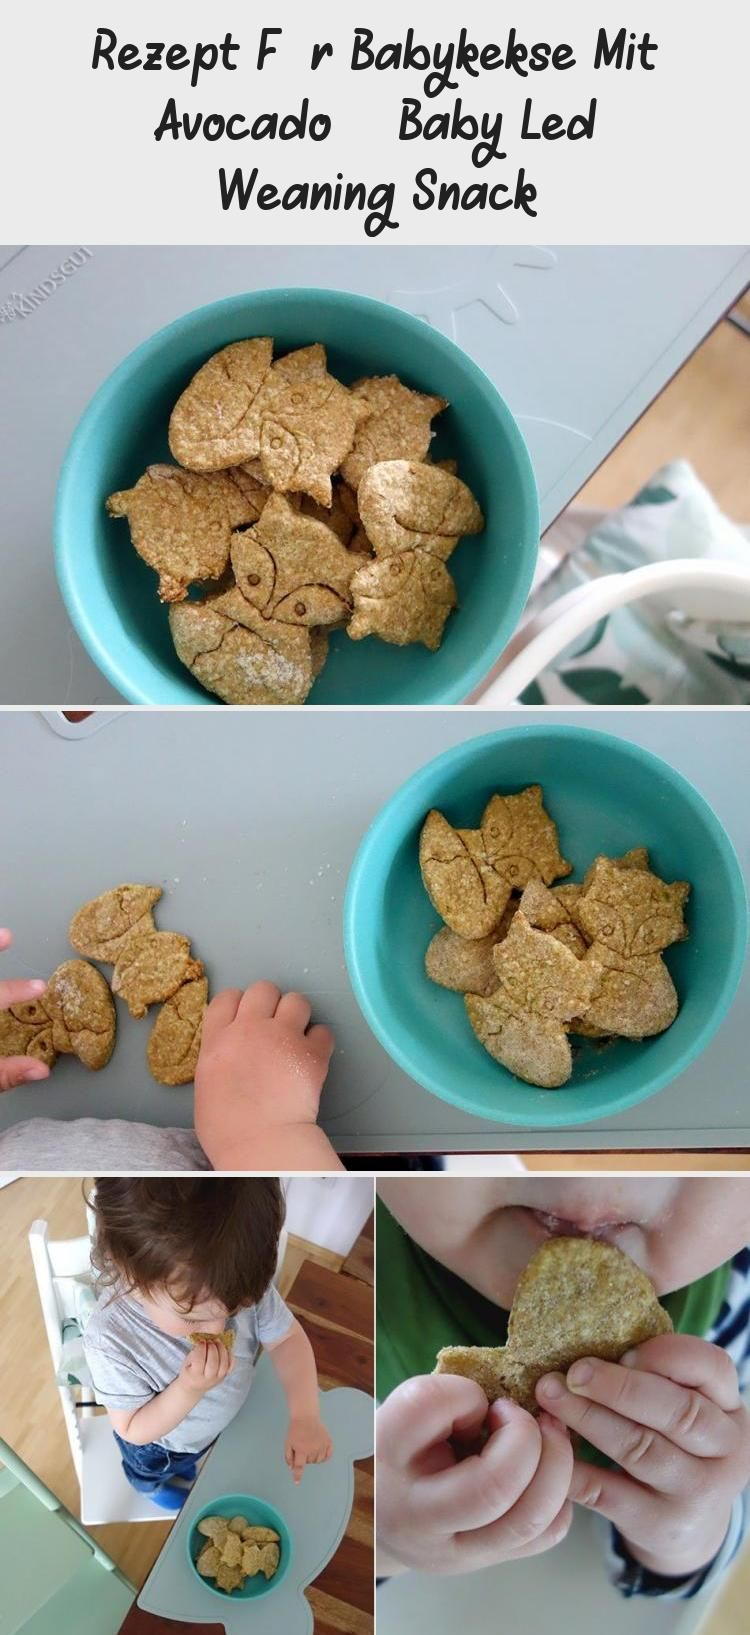 Rezept Fur Vegane Zuckerfreie Babykekse Mit Avocado Baby Led Weaning Breibrei In 2020 Roasted Sweet Potato Cubes Food Processor Recipes Zucchini Side Dish Recipes